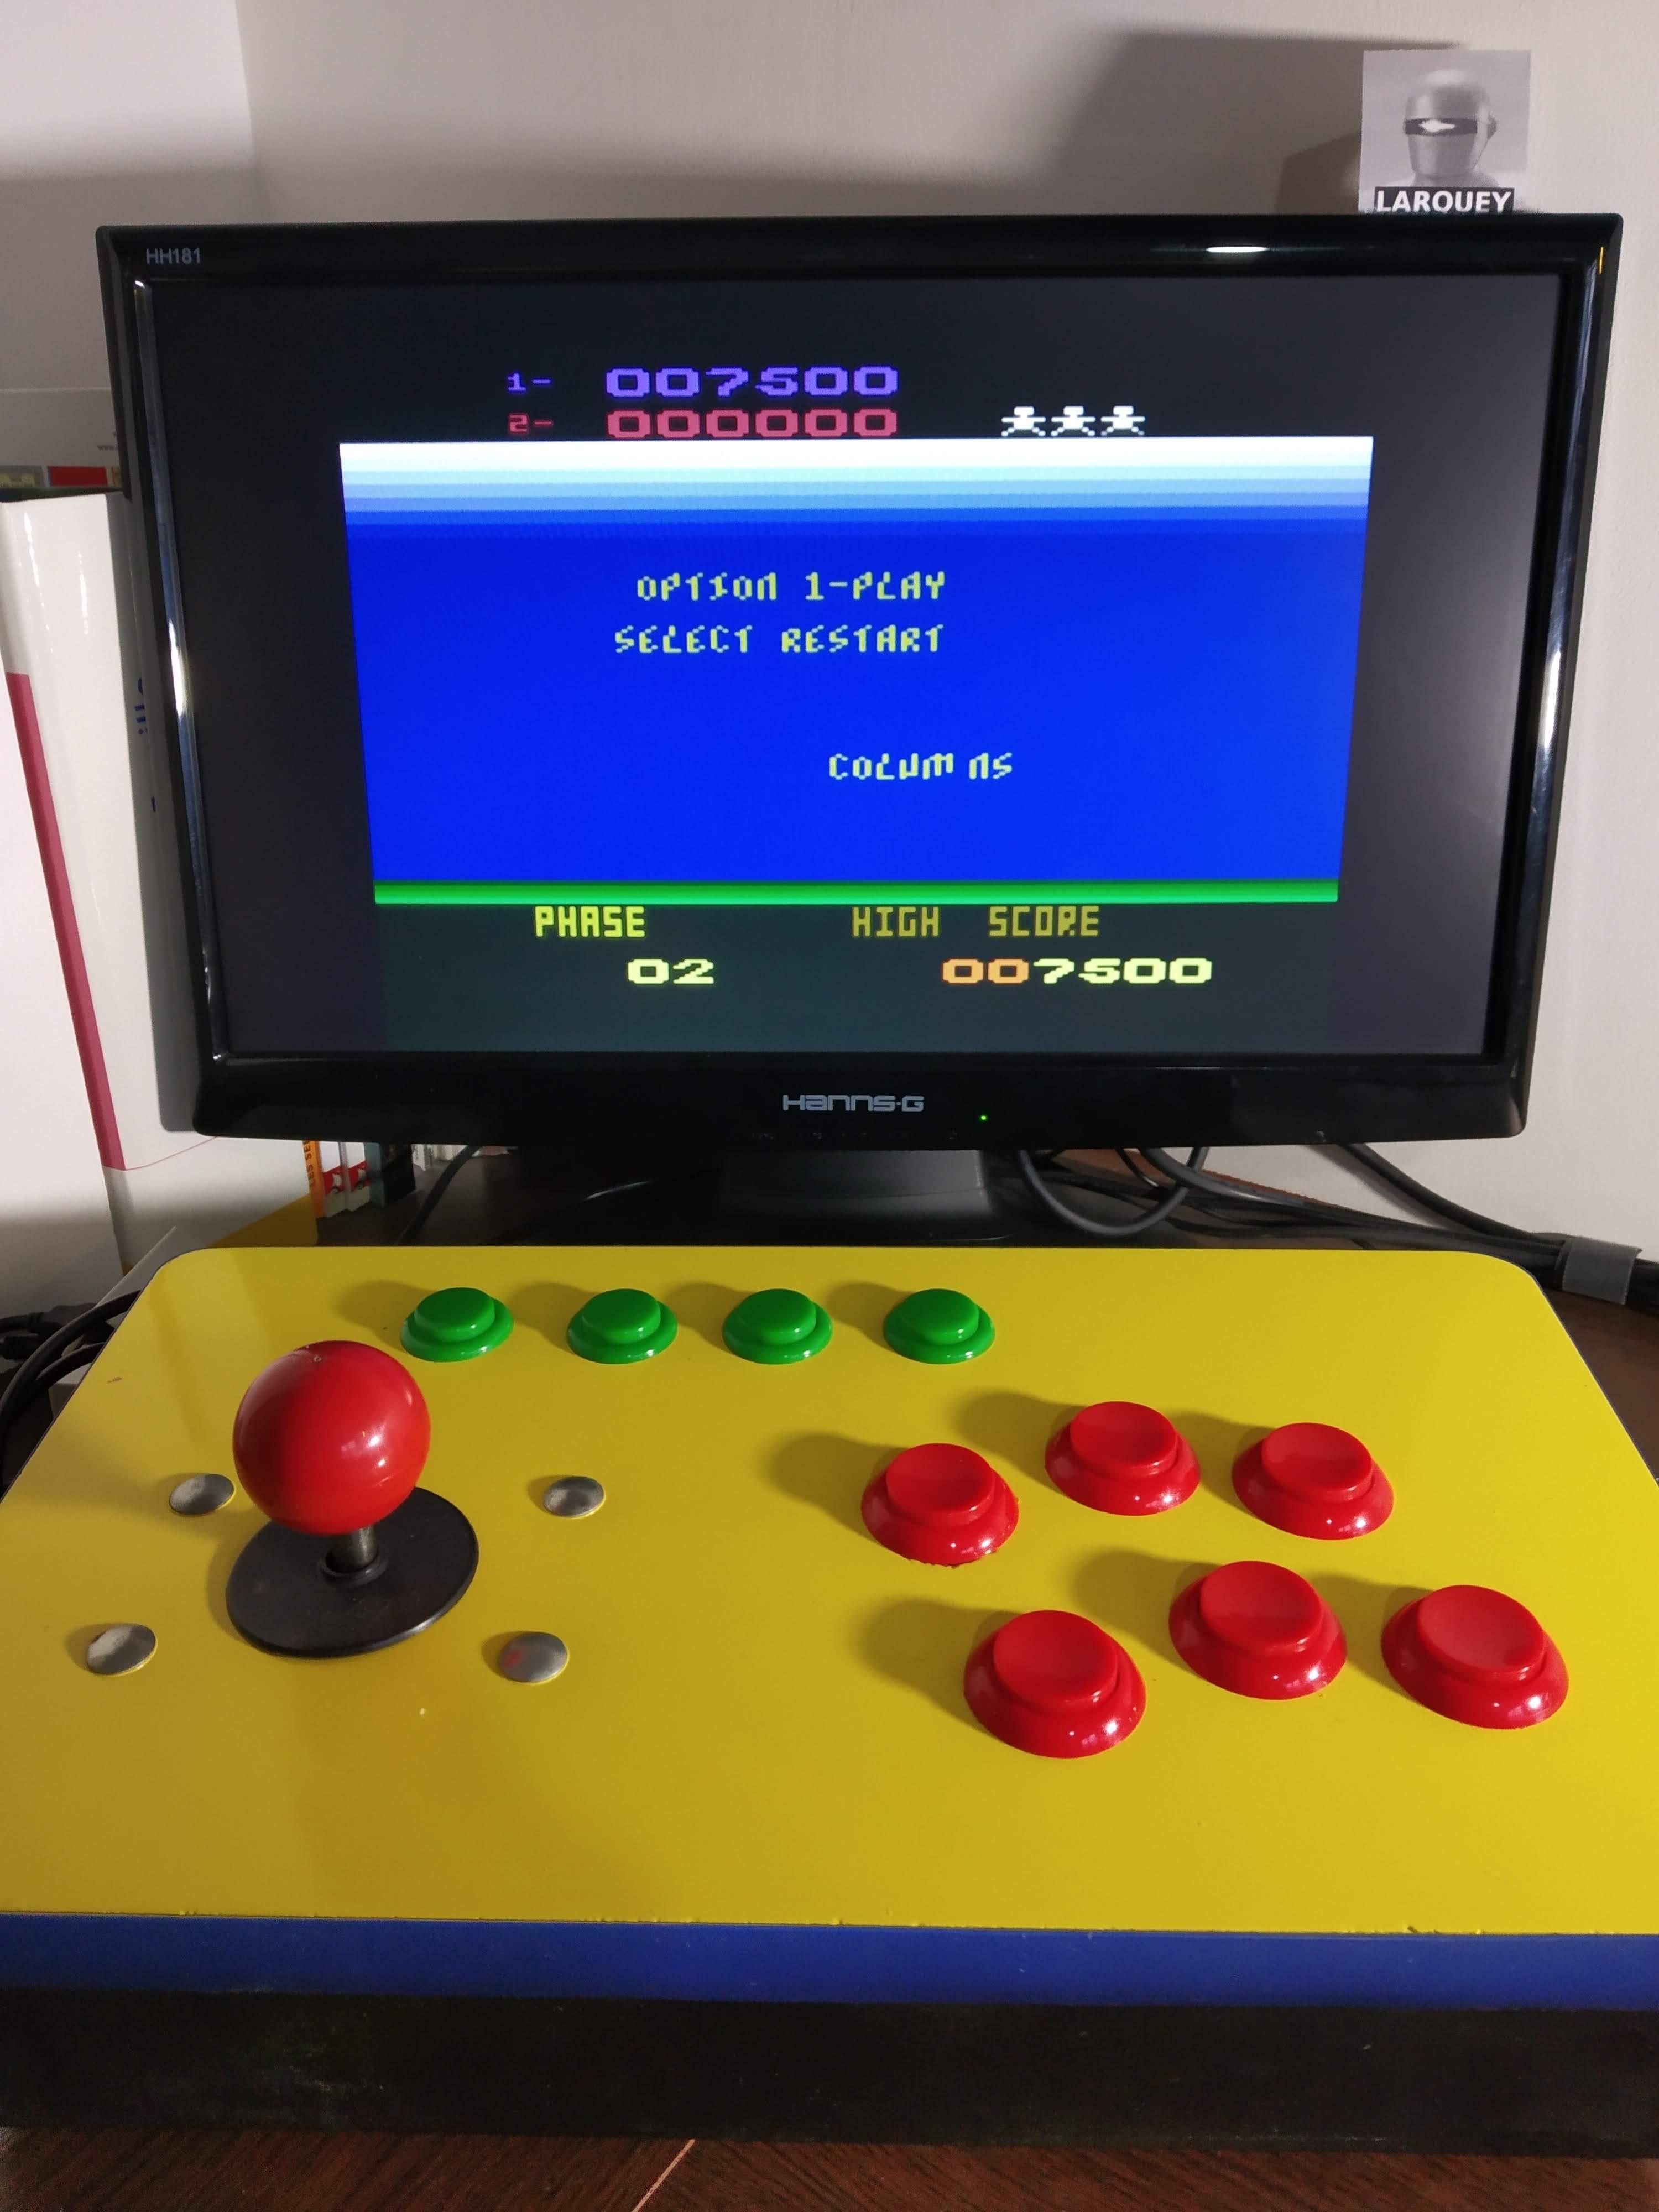 Larquey: Aztec Challenge for Atari 400 800 XL XE (Atari 400/800/XL/XE Emulated) 7,500 points on 2019-12-01 11:56:51